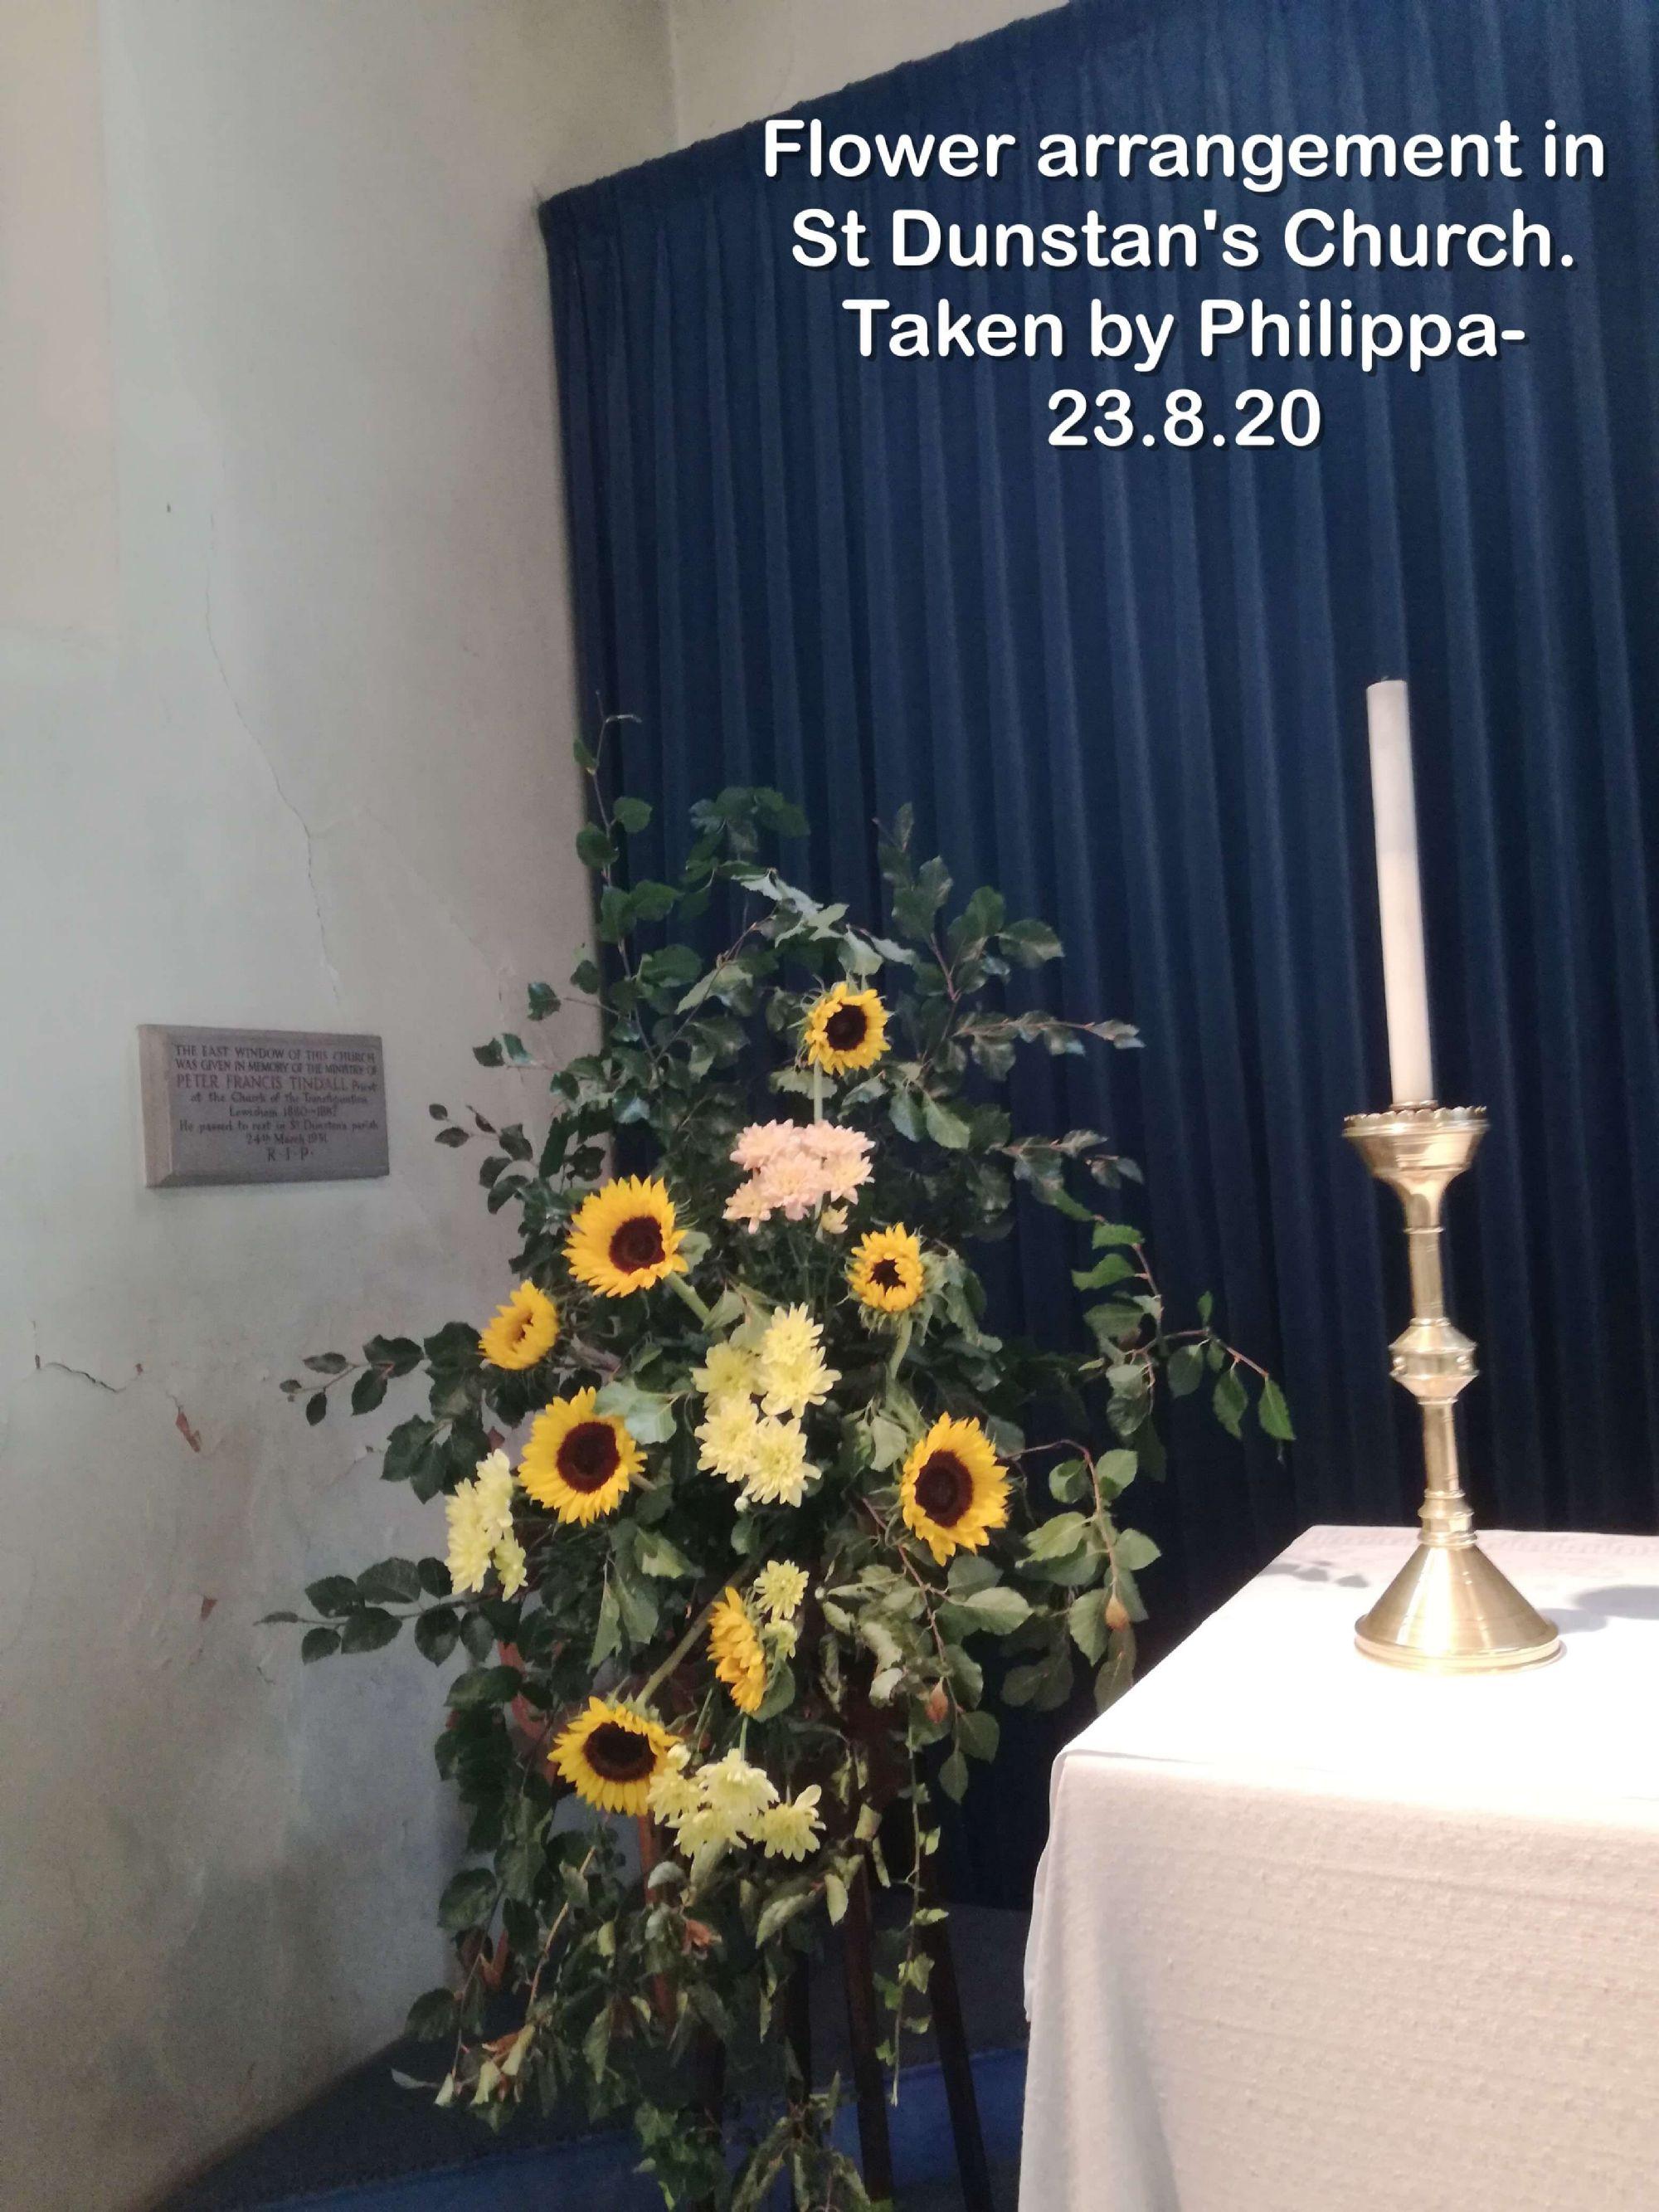 Flower arrangement in St Dunstan's Church.